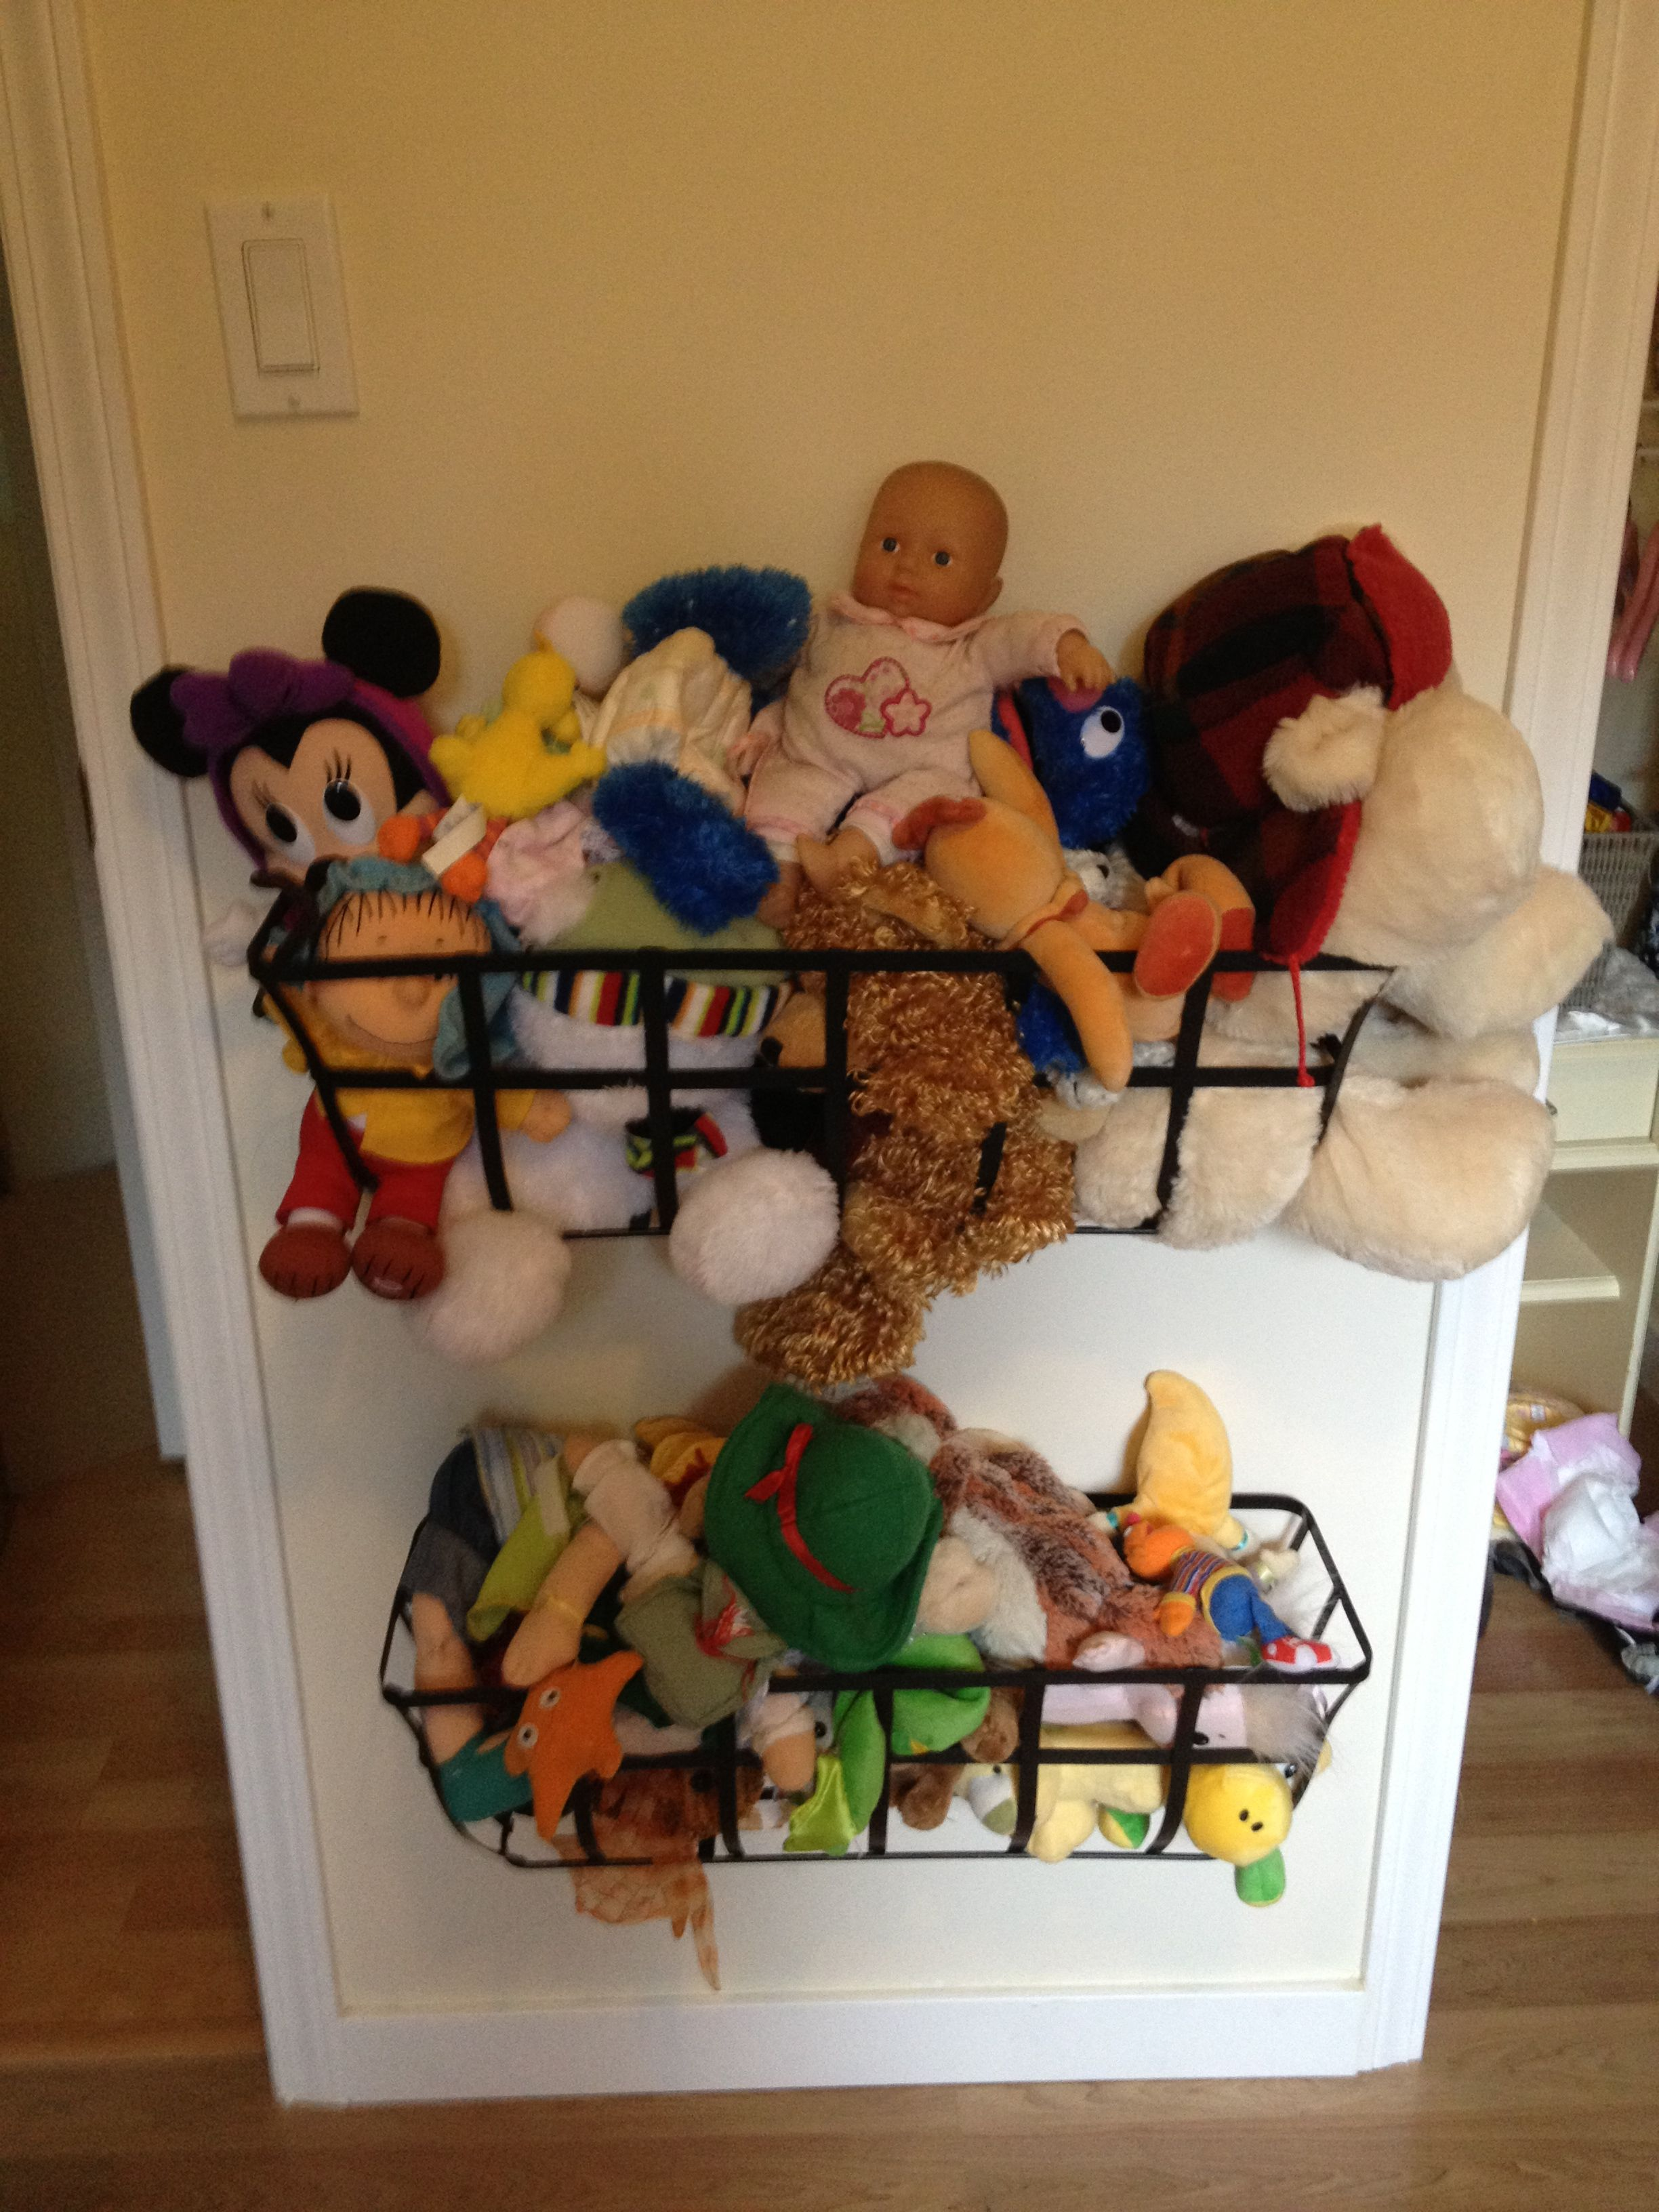 Blue Storage Kids Toy Box Playroom Furniture Bedroom Girls: Metal Planter Boxes For Stuffed Animal Storage, Emma's